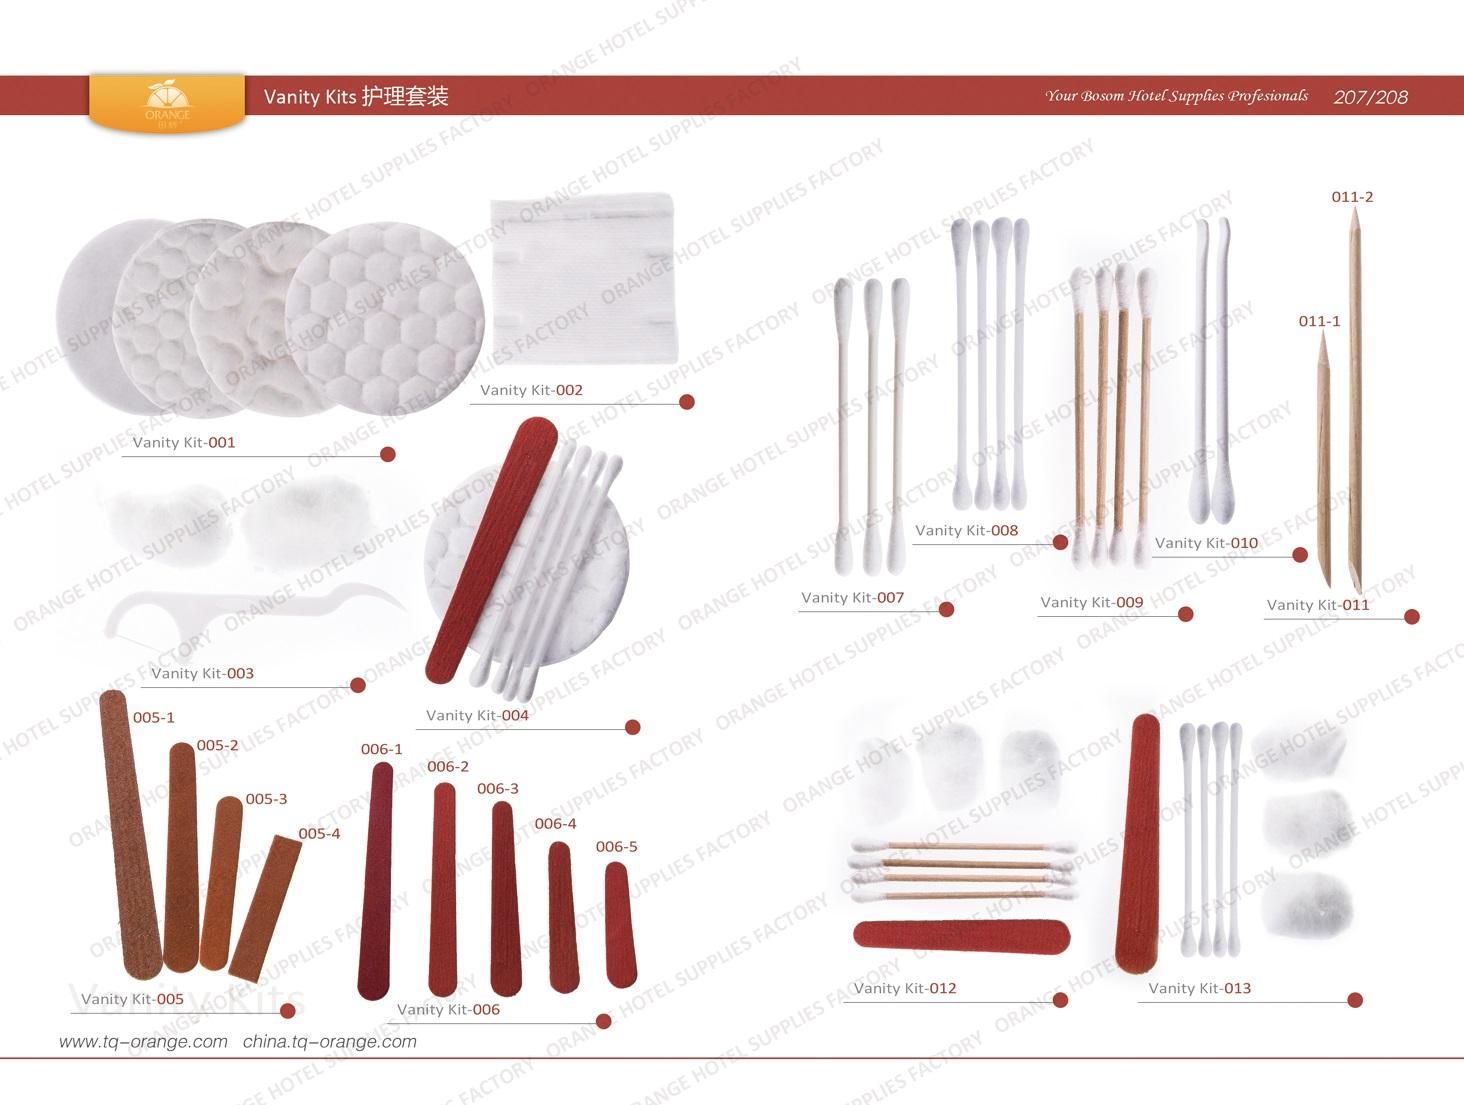 Vanity kits 001~013